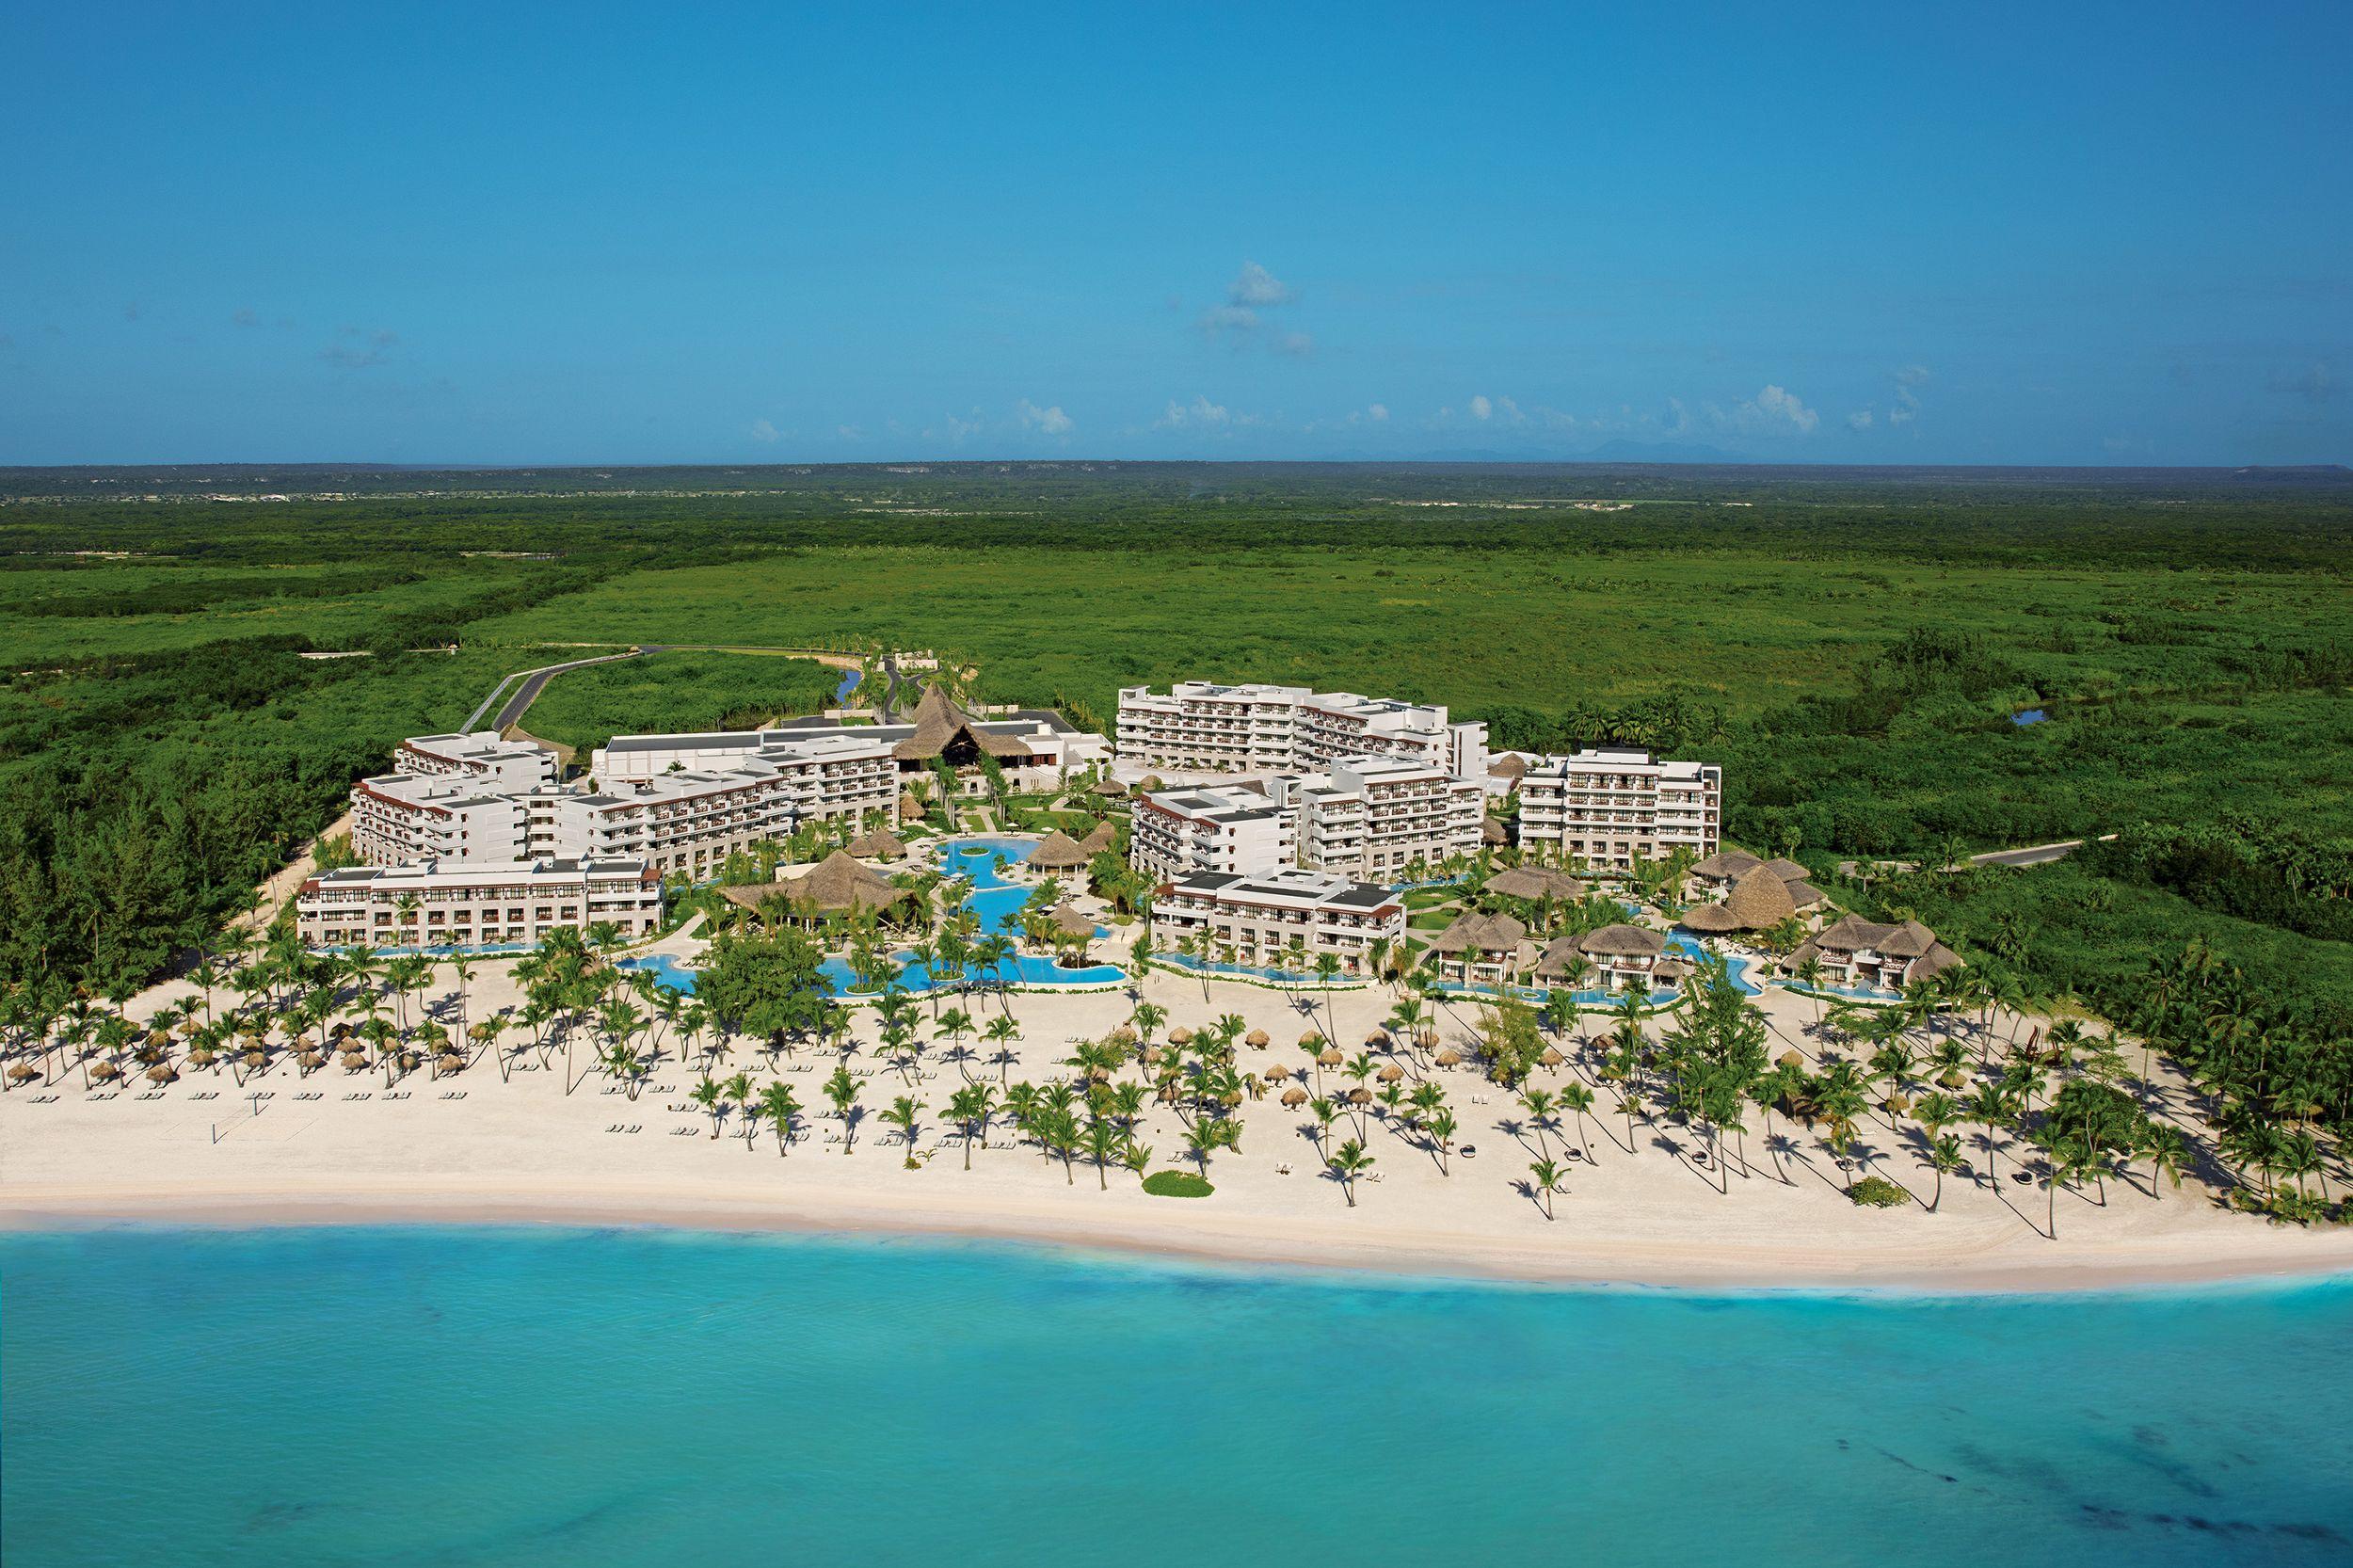 OUR HONEYMOON LOCATION - Secrets Cap Cana, Punta Cana, Dominican Republic